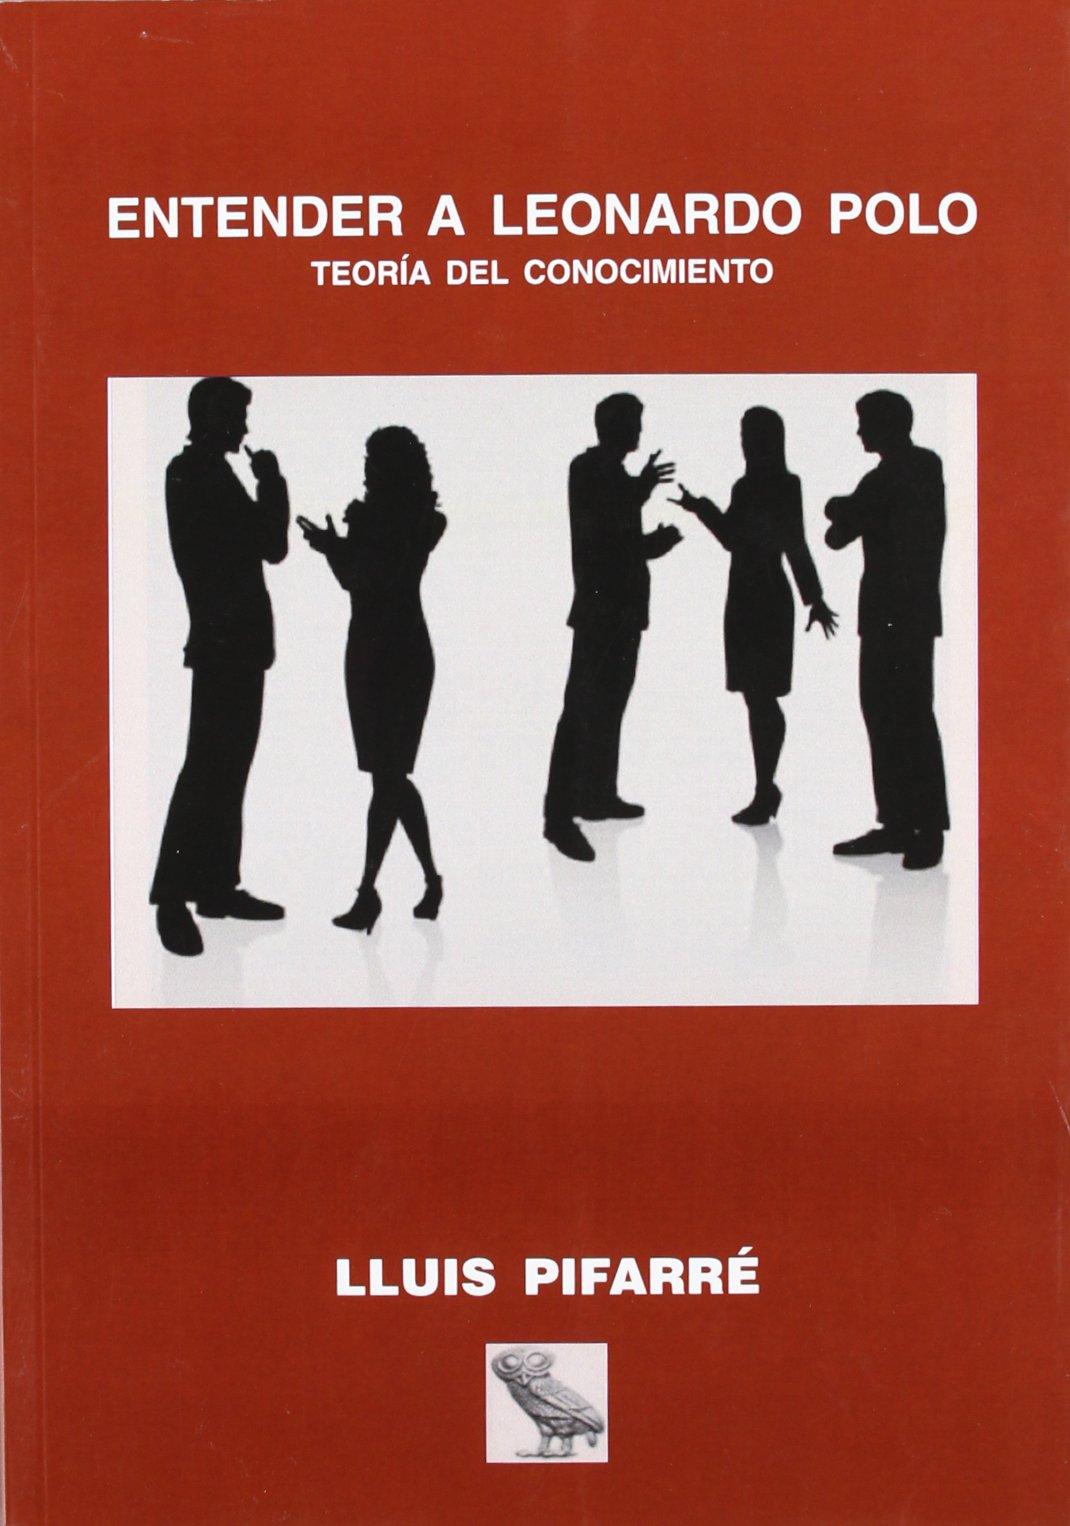 Entender a leonardo polo: Amazon.es: LLUIS PIFARRE: Libros